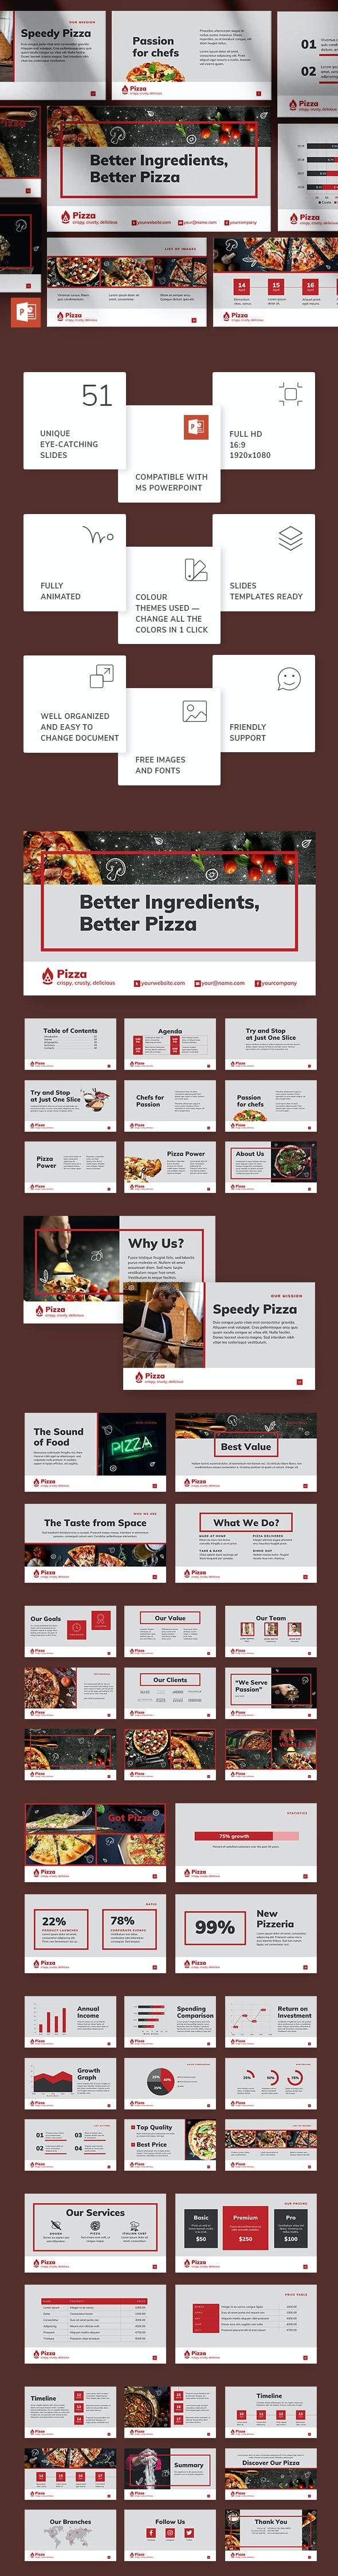 Pizza Restaurant PowerPoint Presentation Template - Miscellaneous PowerPoint Templates